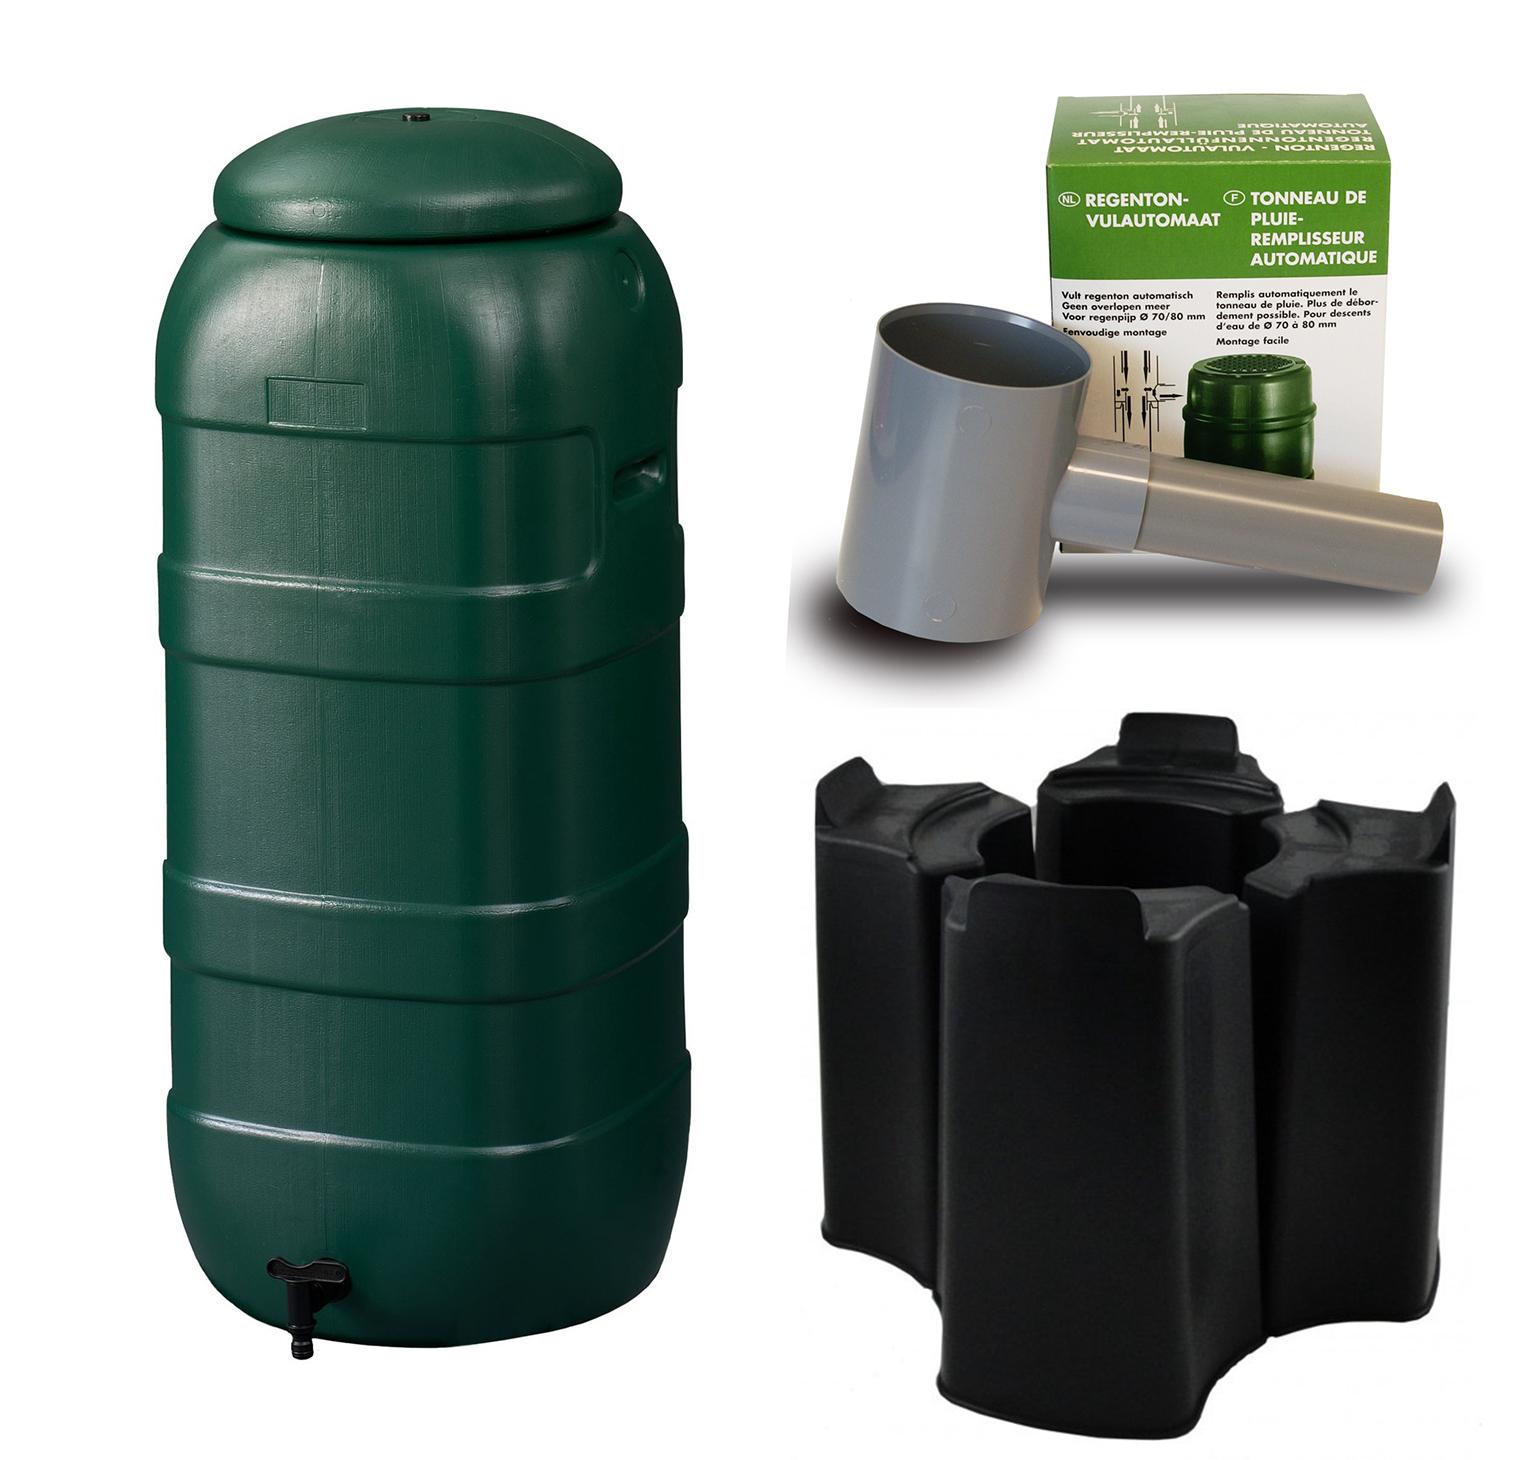 Harcostar Rainsaver 100 Liter Groen met Vulautomaat en Voet